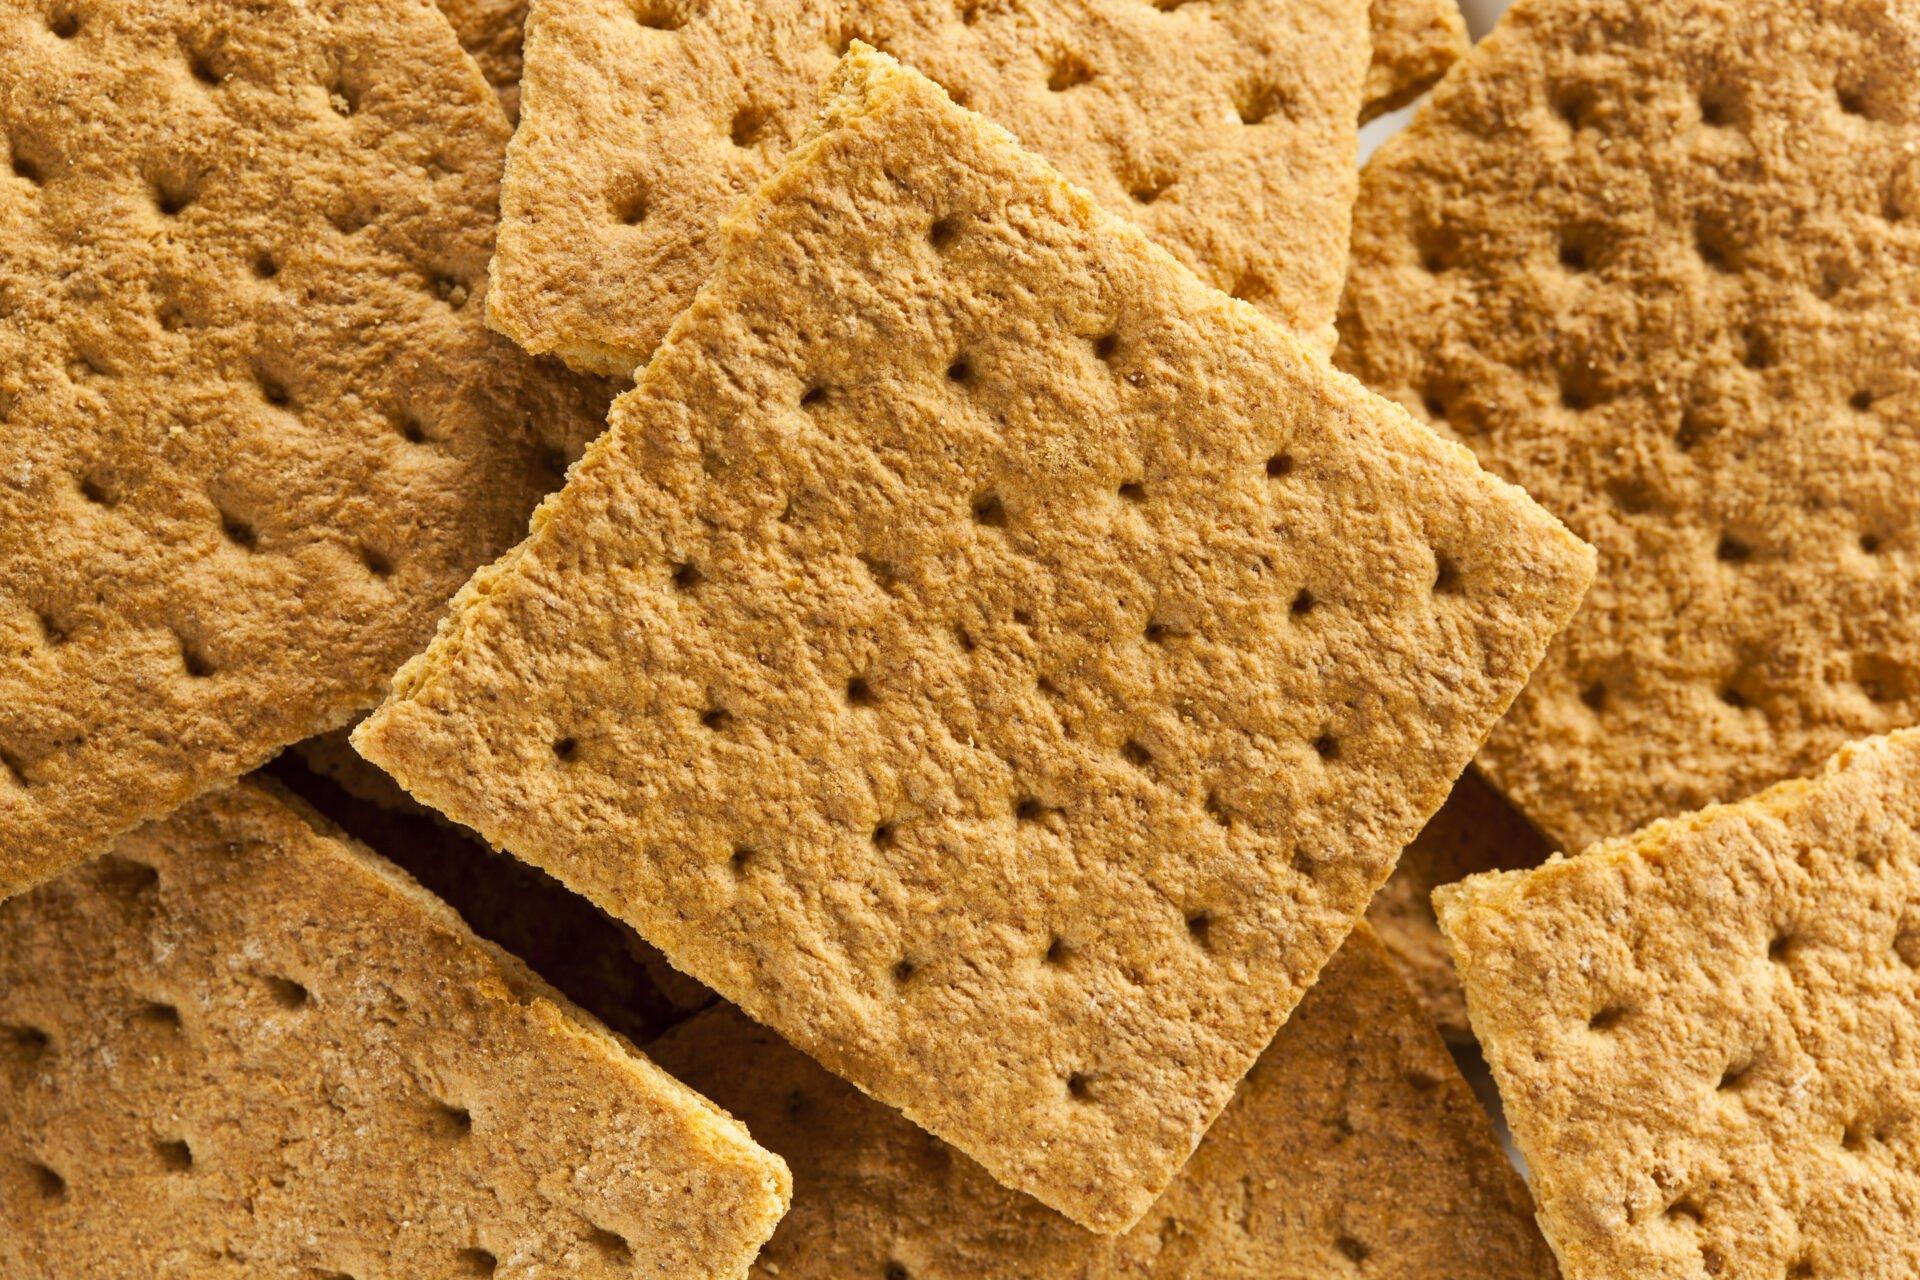 Glyphosate Testing--Honeymaid Graham Cracker Results 2021